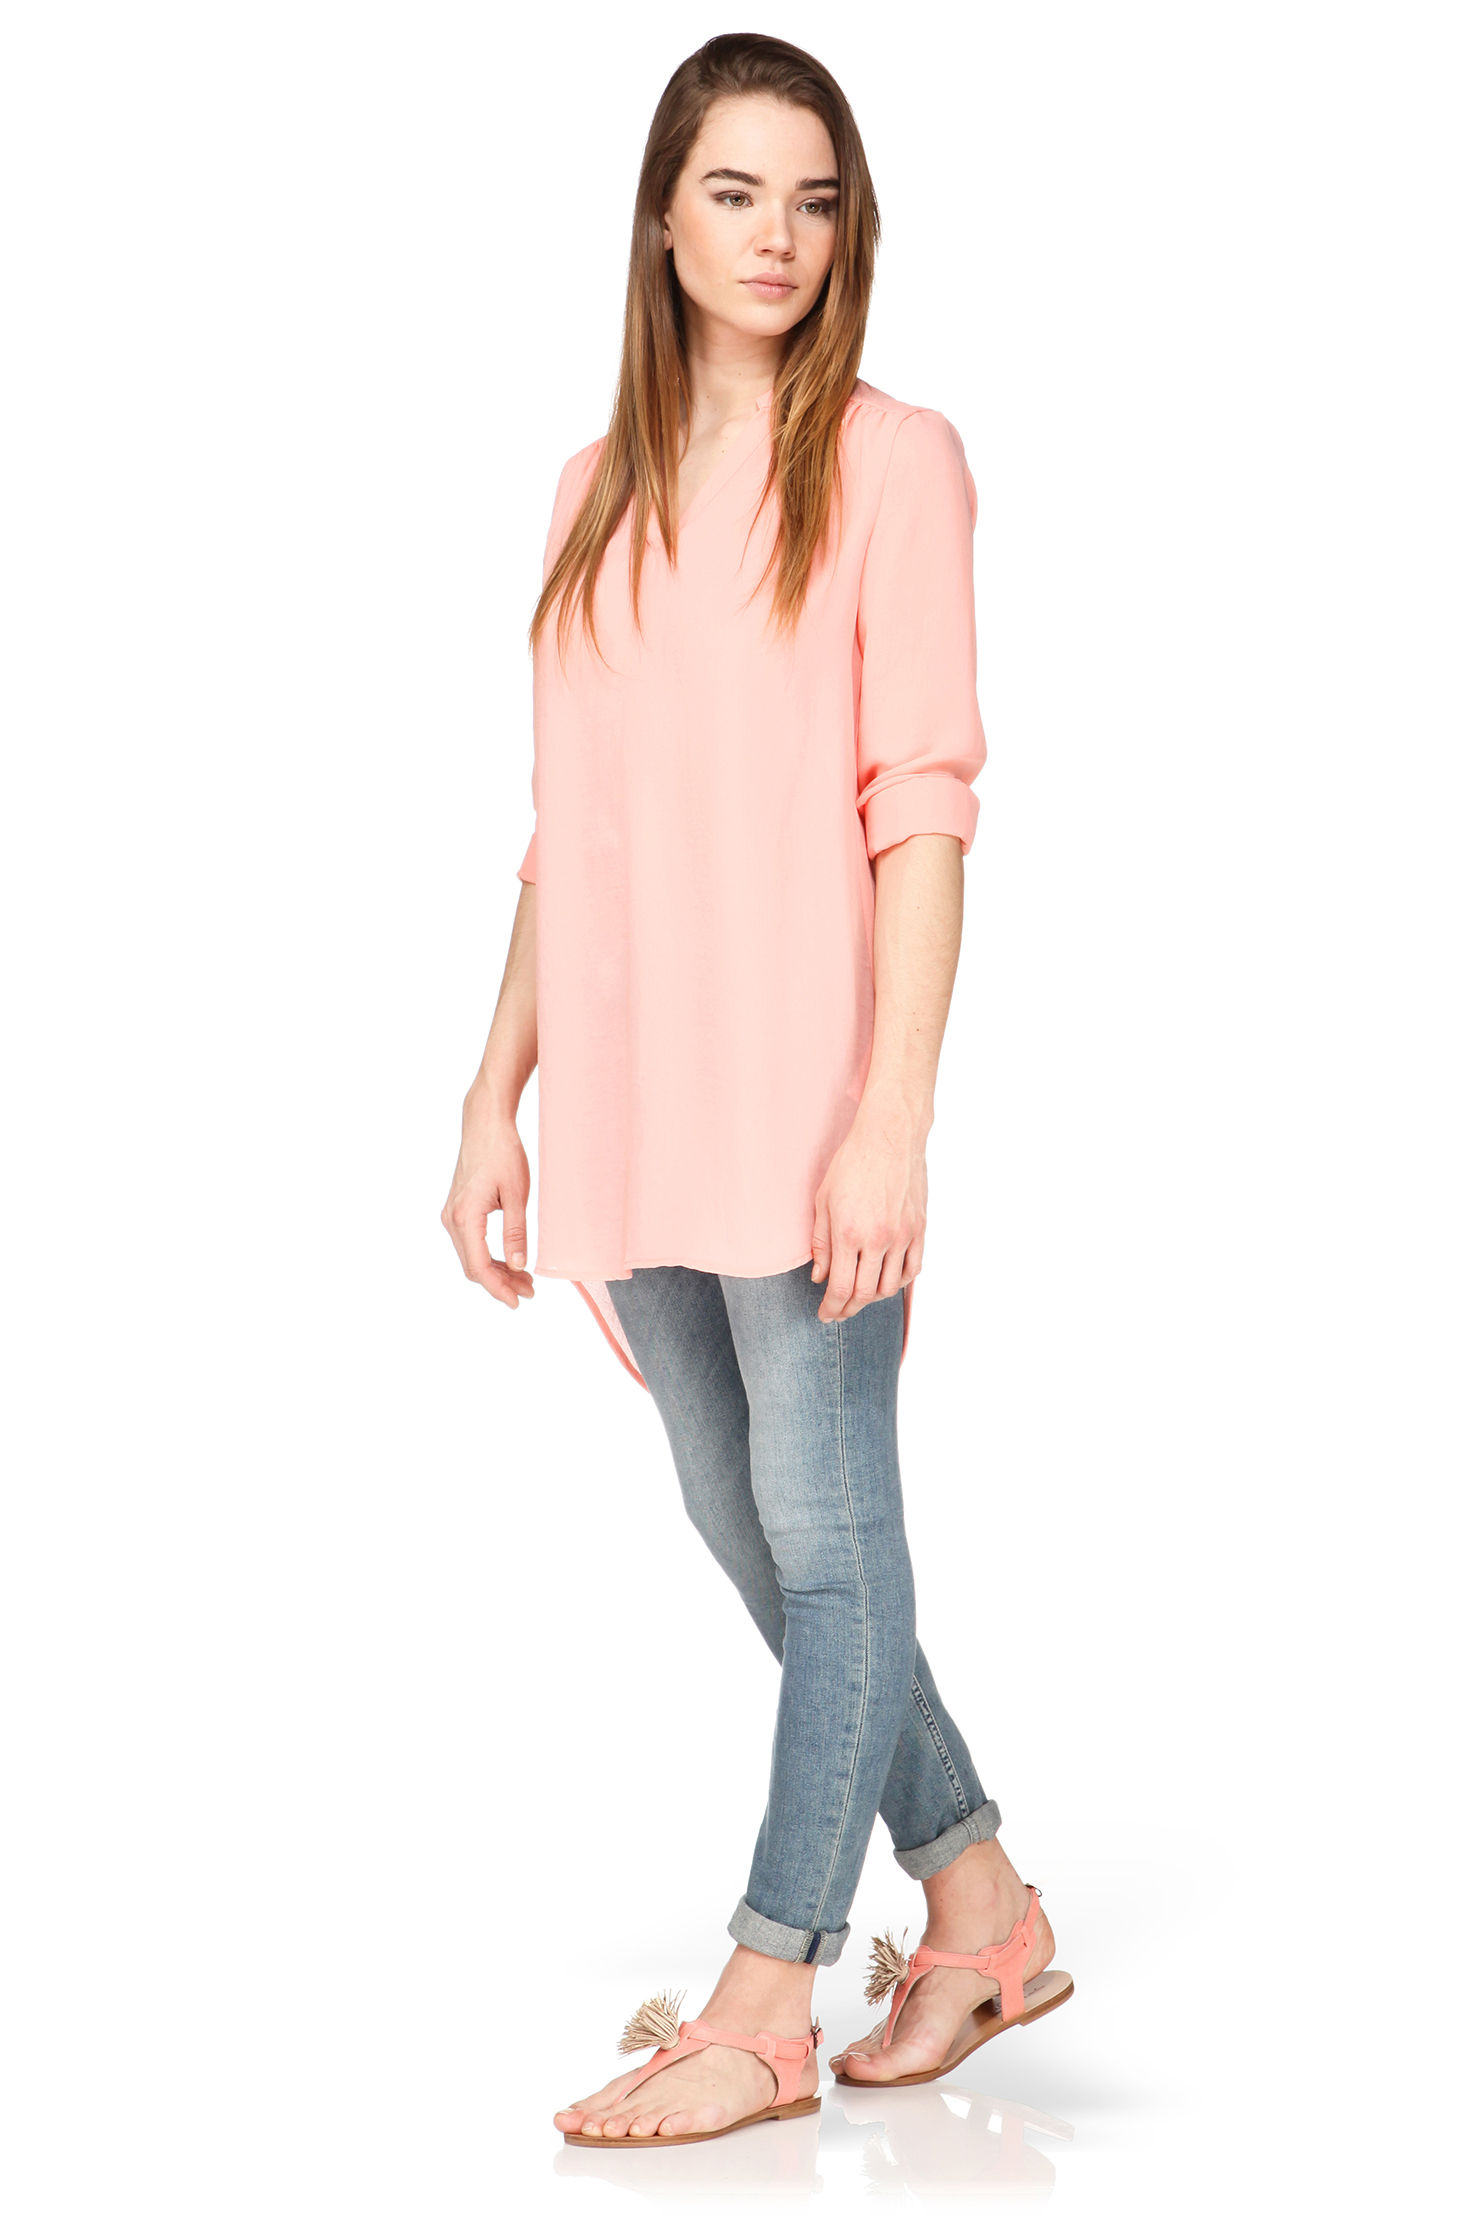 vila women Vila clothes for women wholesale - inter großhandel gmbh.